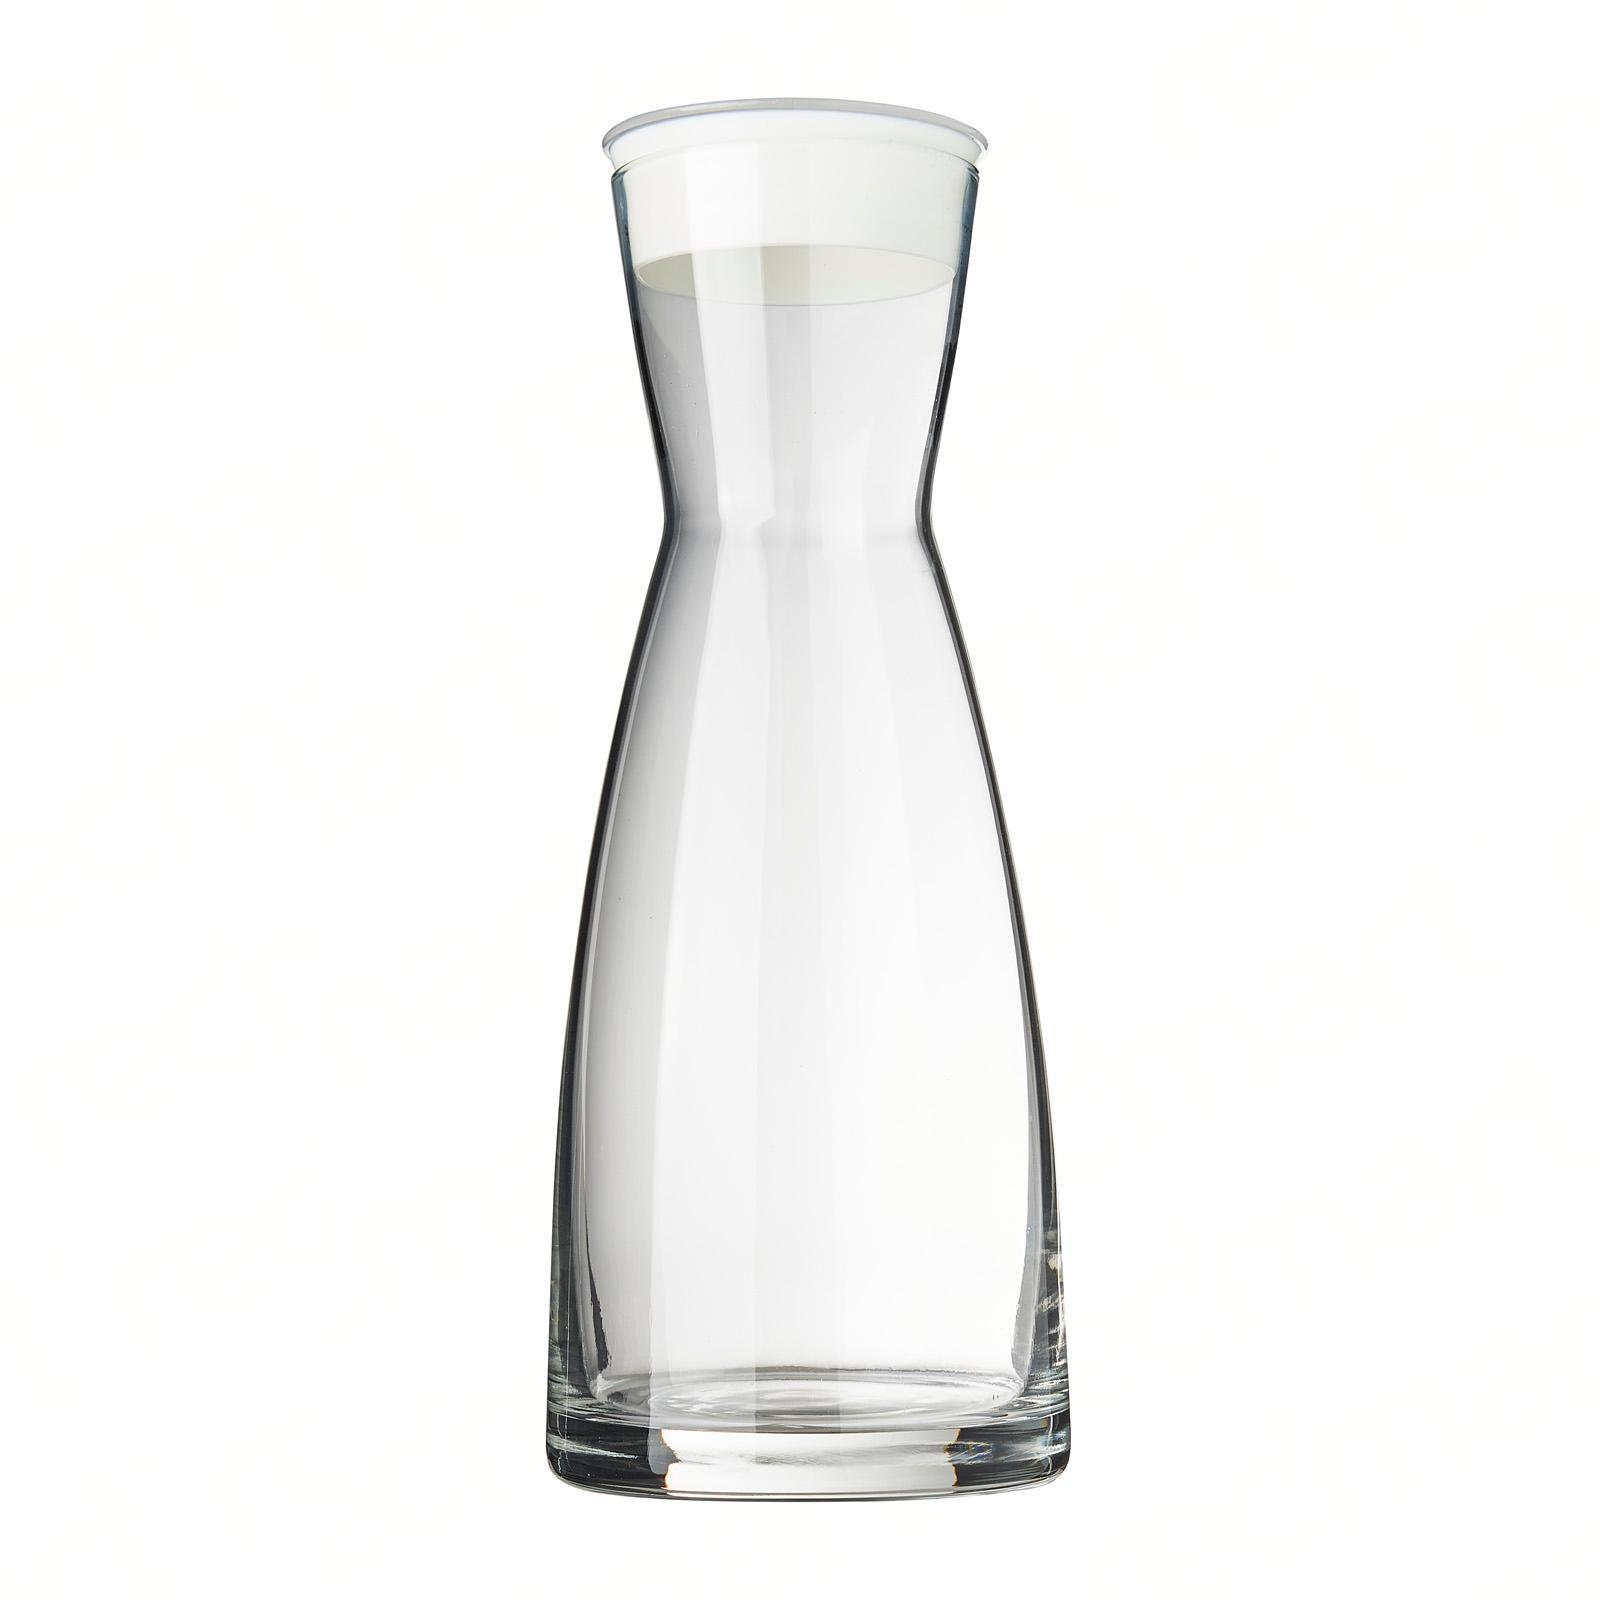 Bormioli Rocco Ypsilon Water Jug Glass Carafe Decanter - White Lid